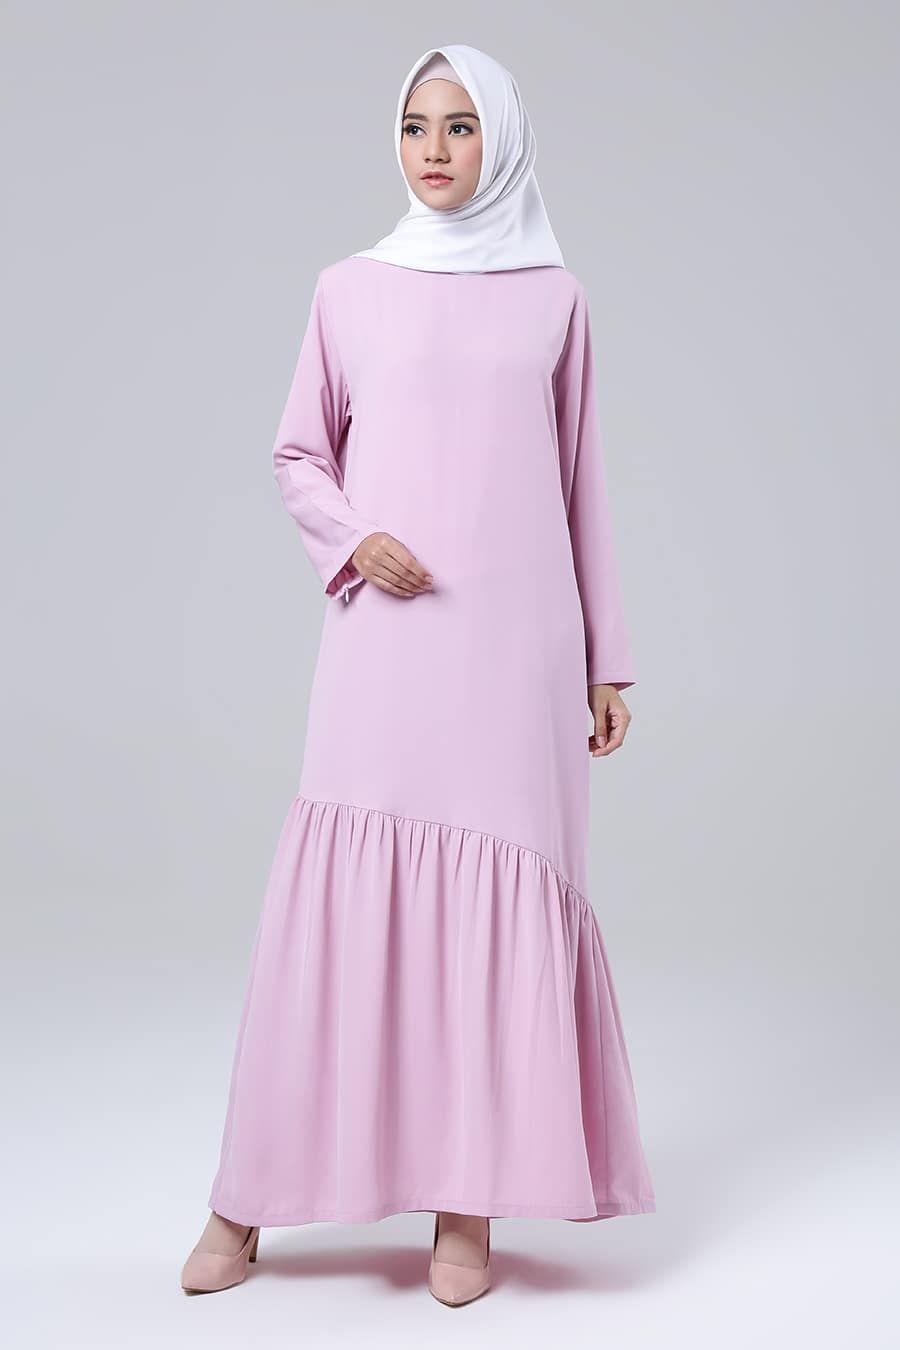 Pin by marsiah yusram on model pakaian hijab pinterest muslim